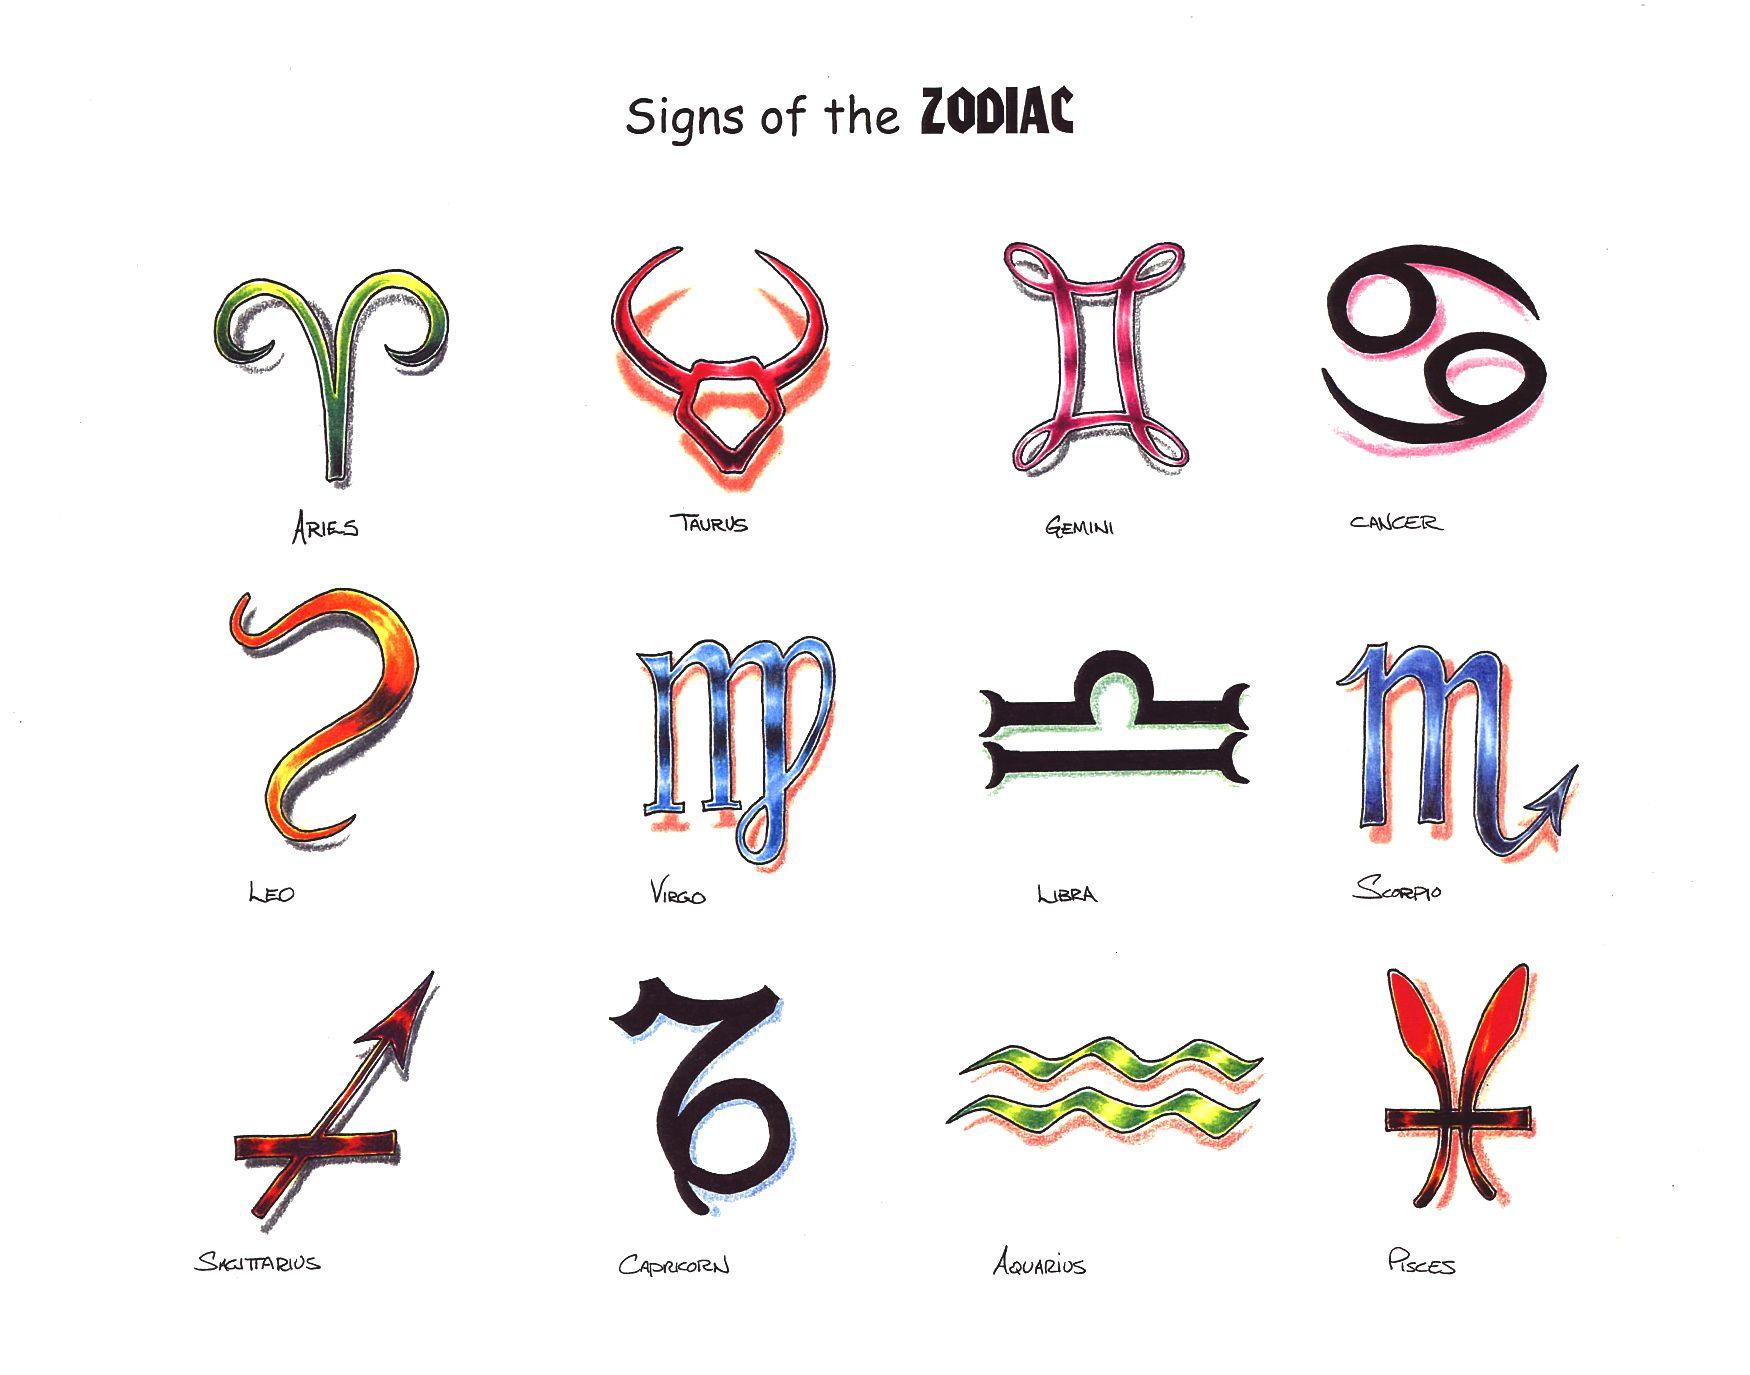 signes astrologiques tatouages recherche google tatoo pinterest signe astrologique. Black Bedroom Furniture Sets. Home Design Ideas